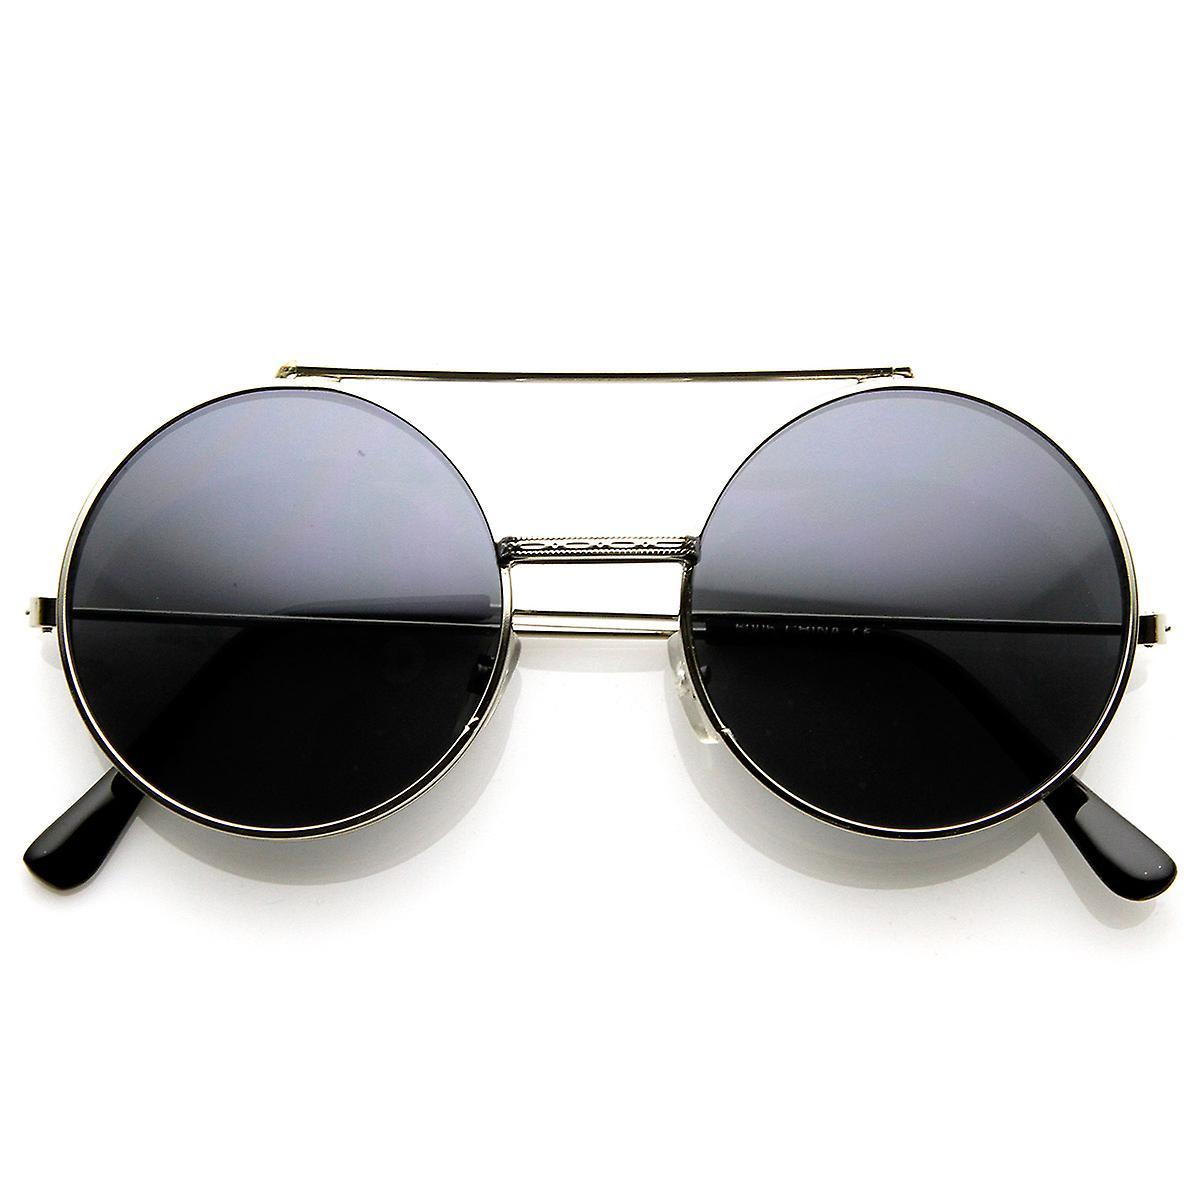 Limited Edition Color Flip-Up Lens Round Circle Django Sunglasses ... c33530a4ba92f